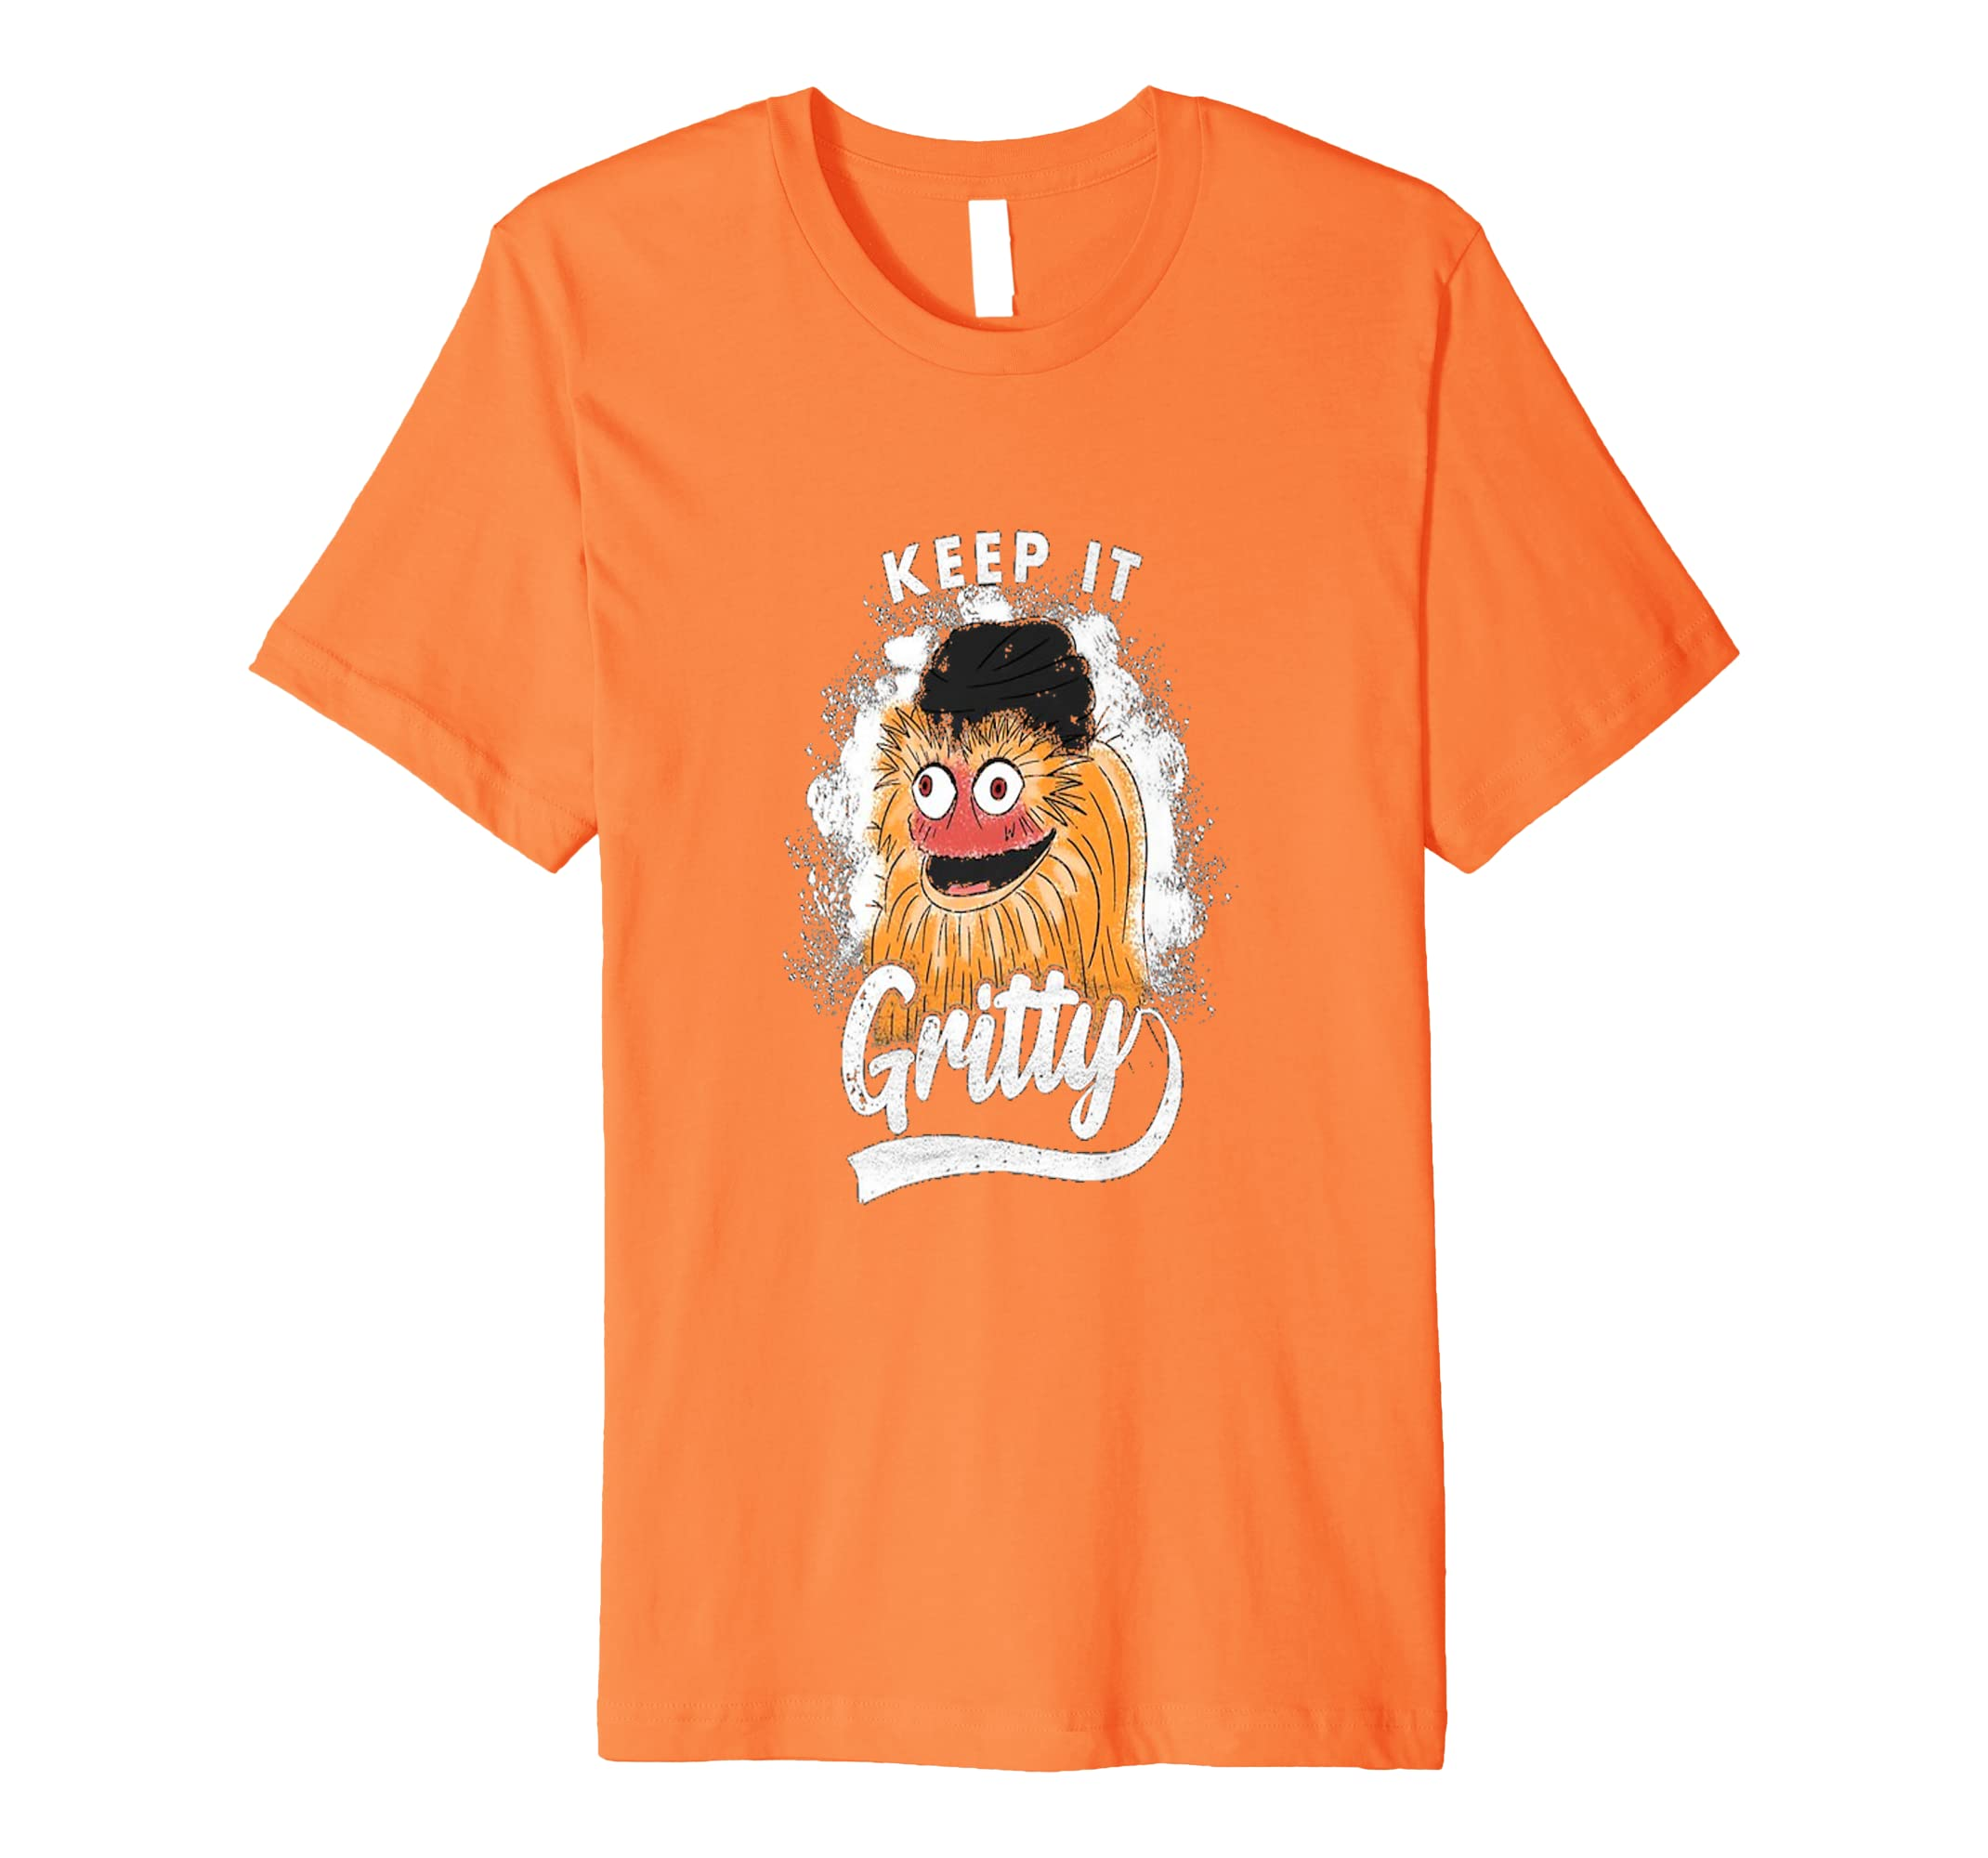 d2792b472 Keep It Gritty Mascot Philly Hockey T Shirt-Colonhue – Colonhue.com